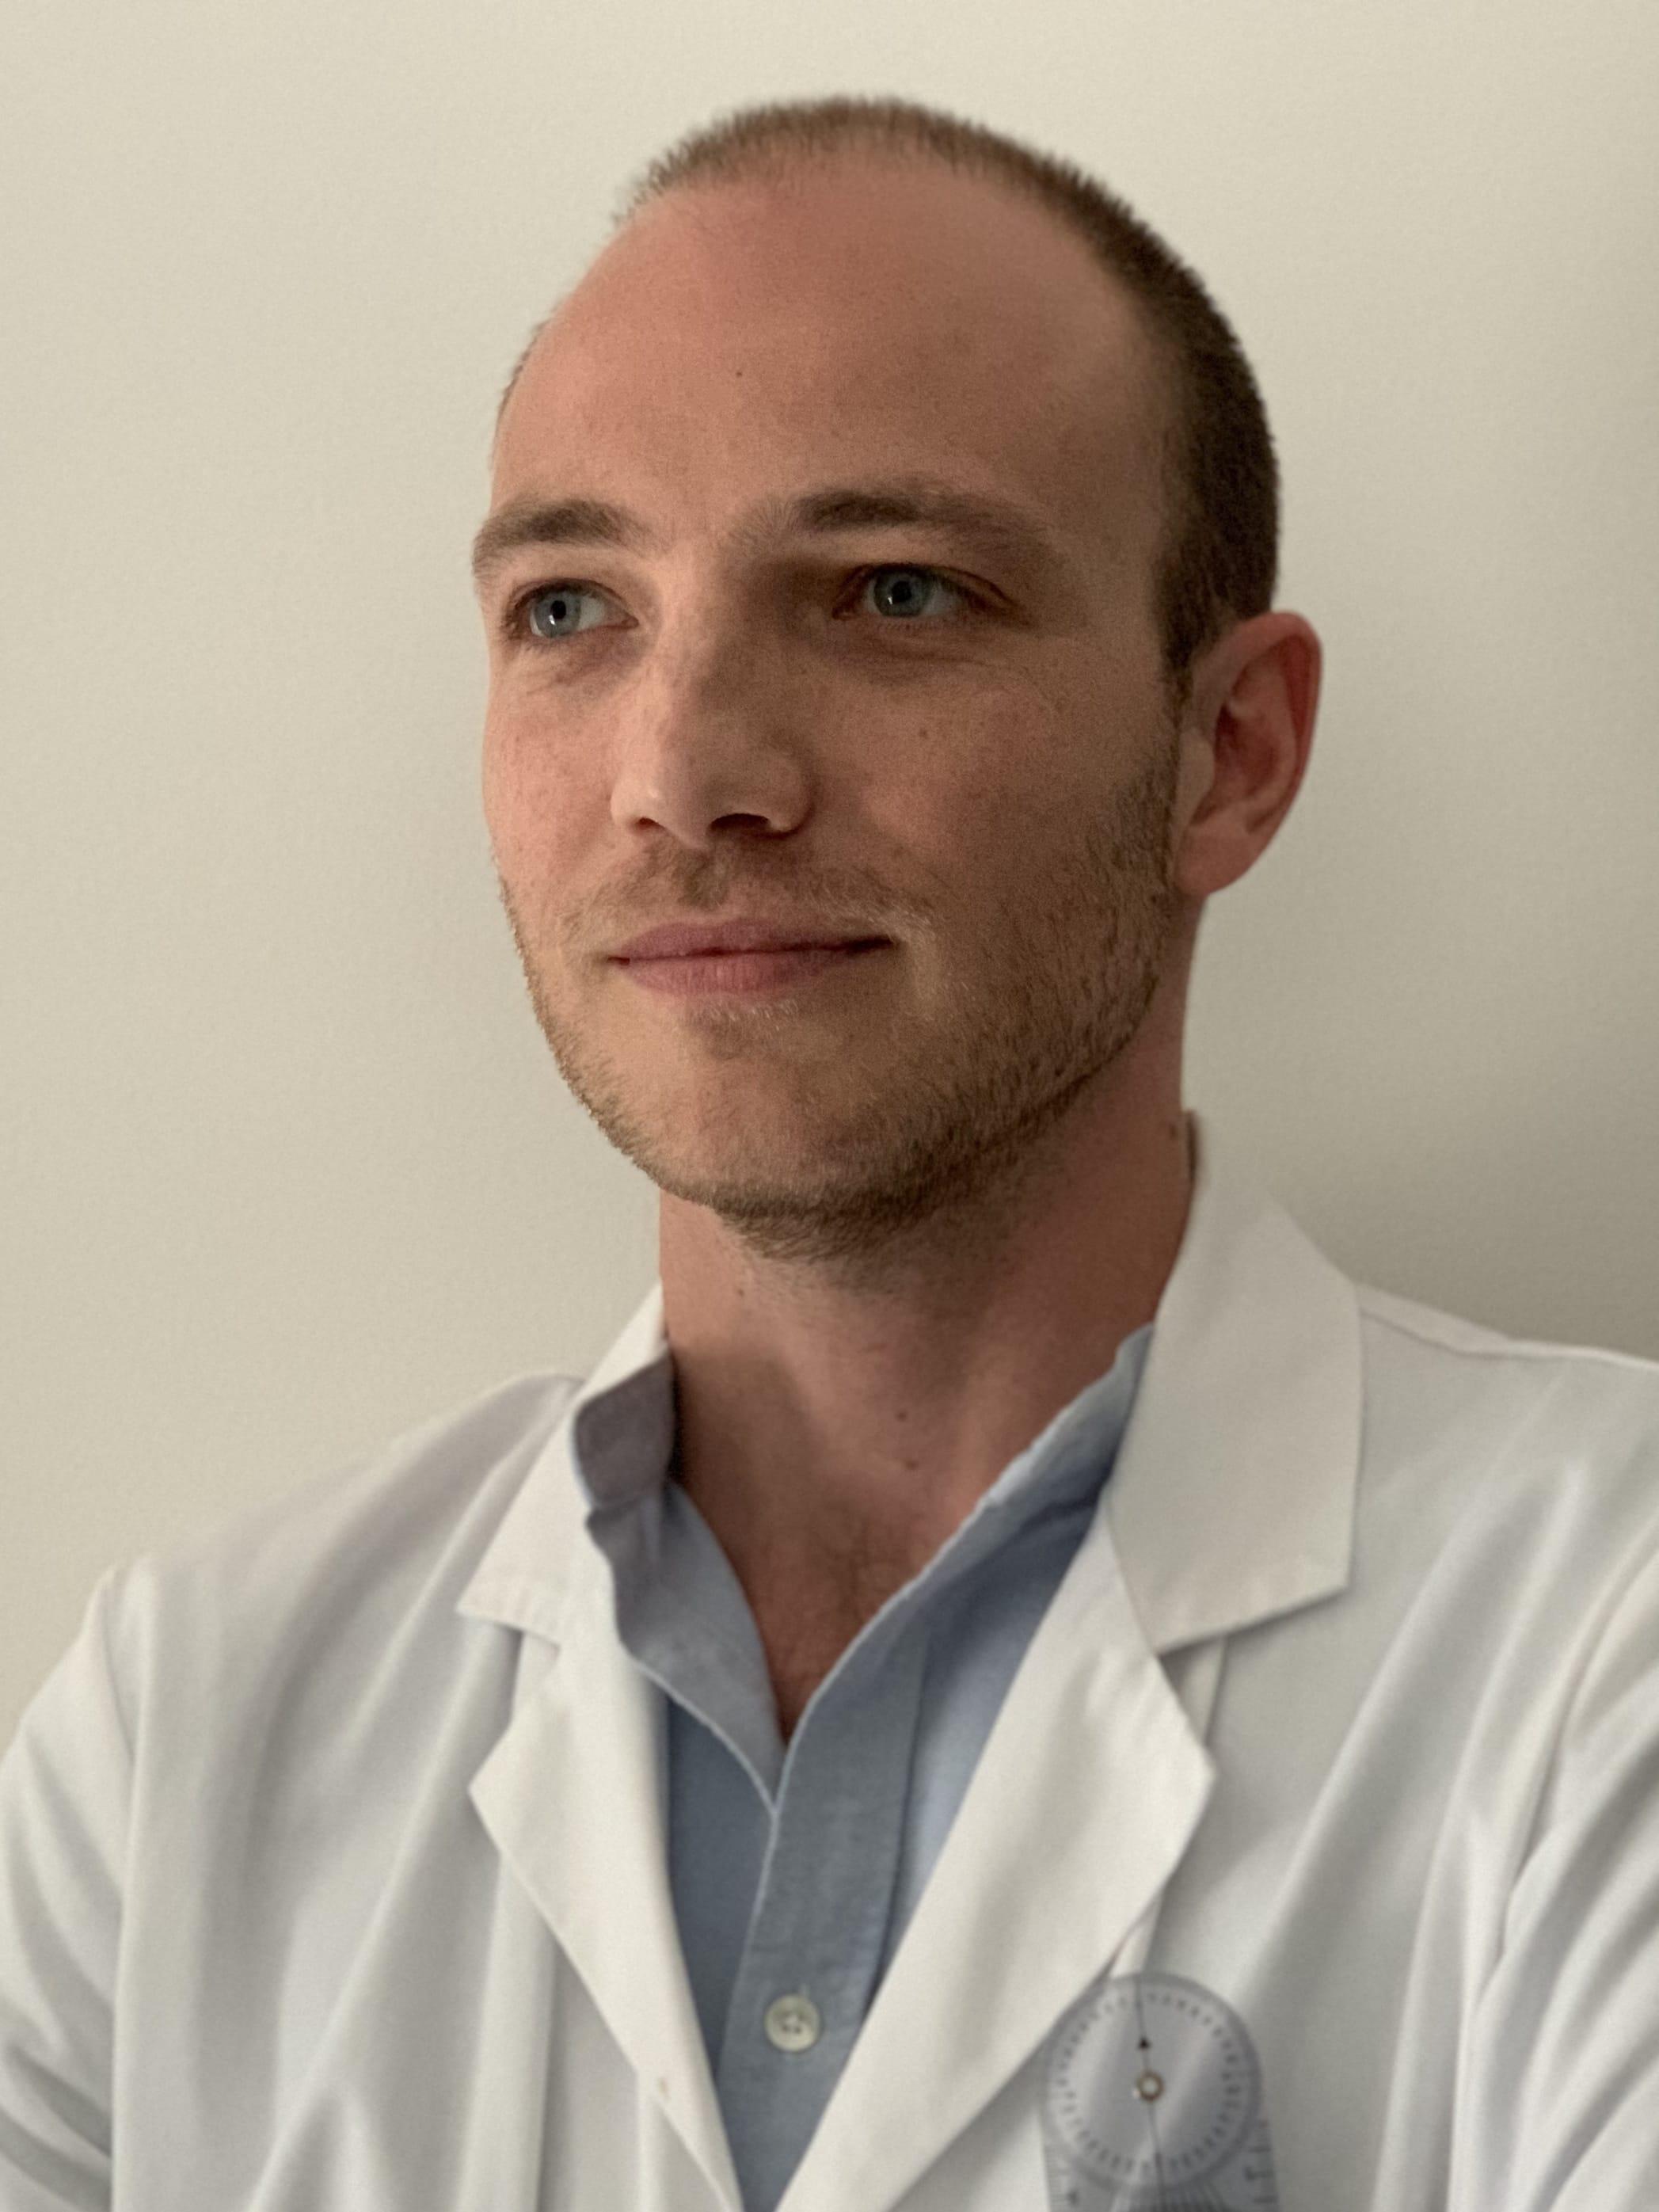 Dr Vittorio Ferrari Chirurgien Orthopédiste à Amiens Chaulnes Beauval